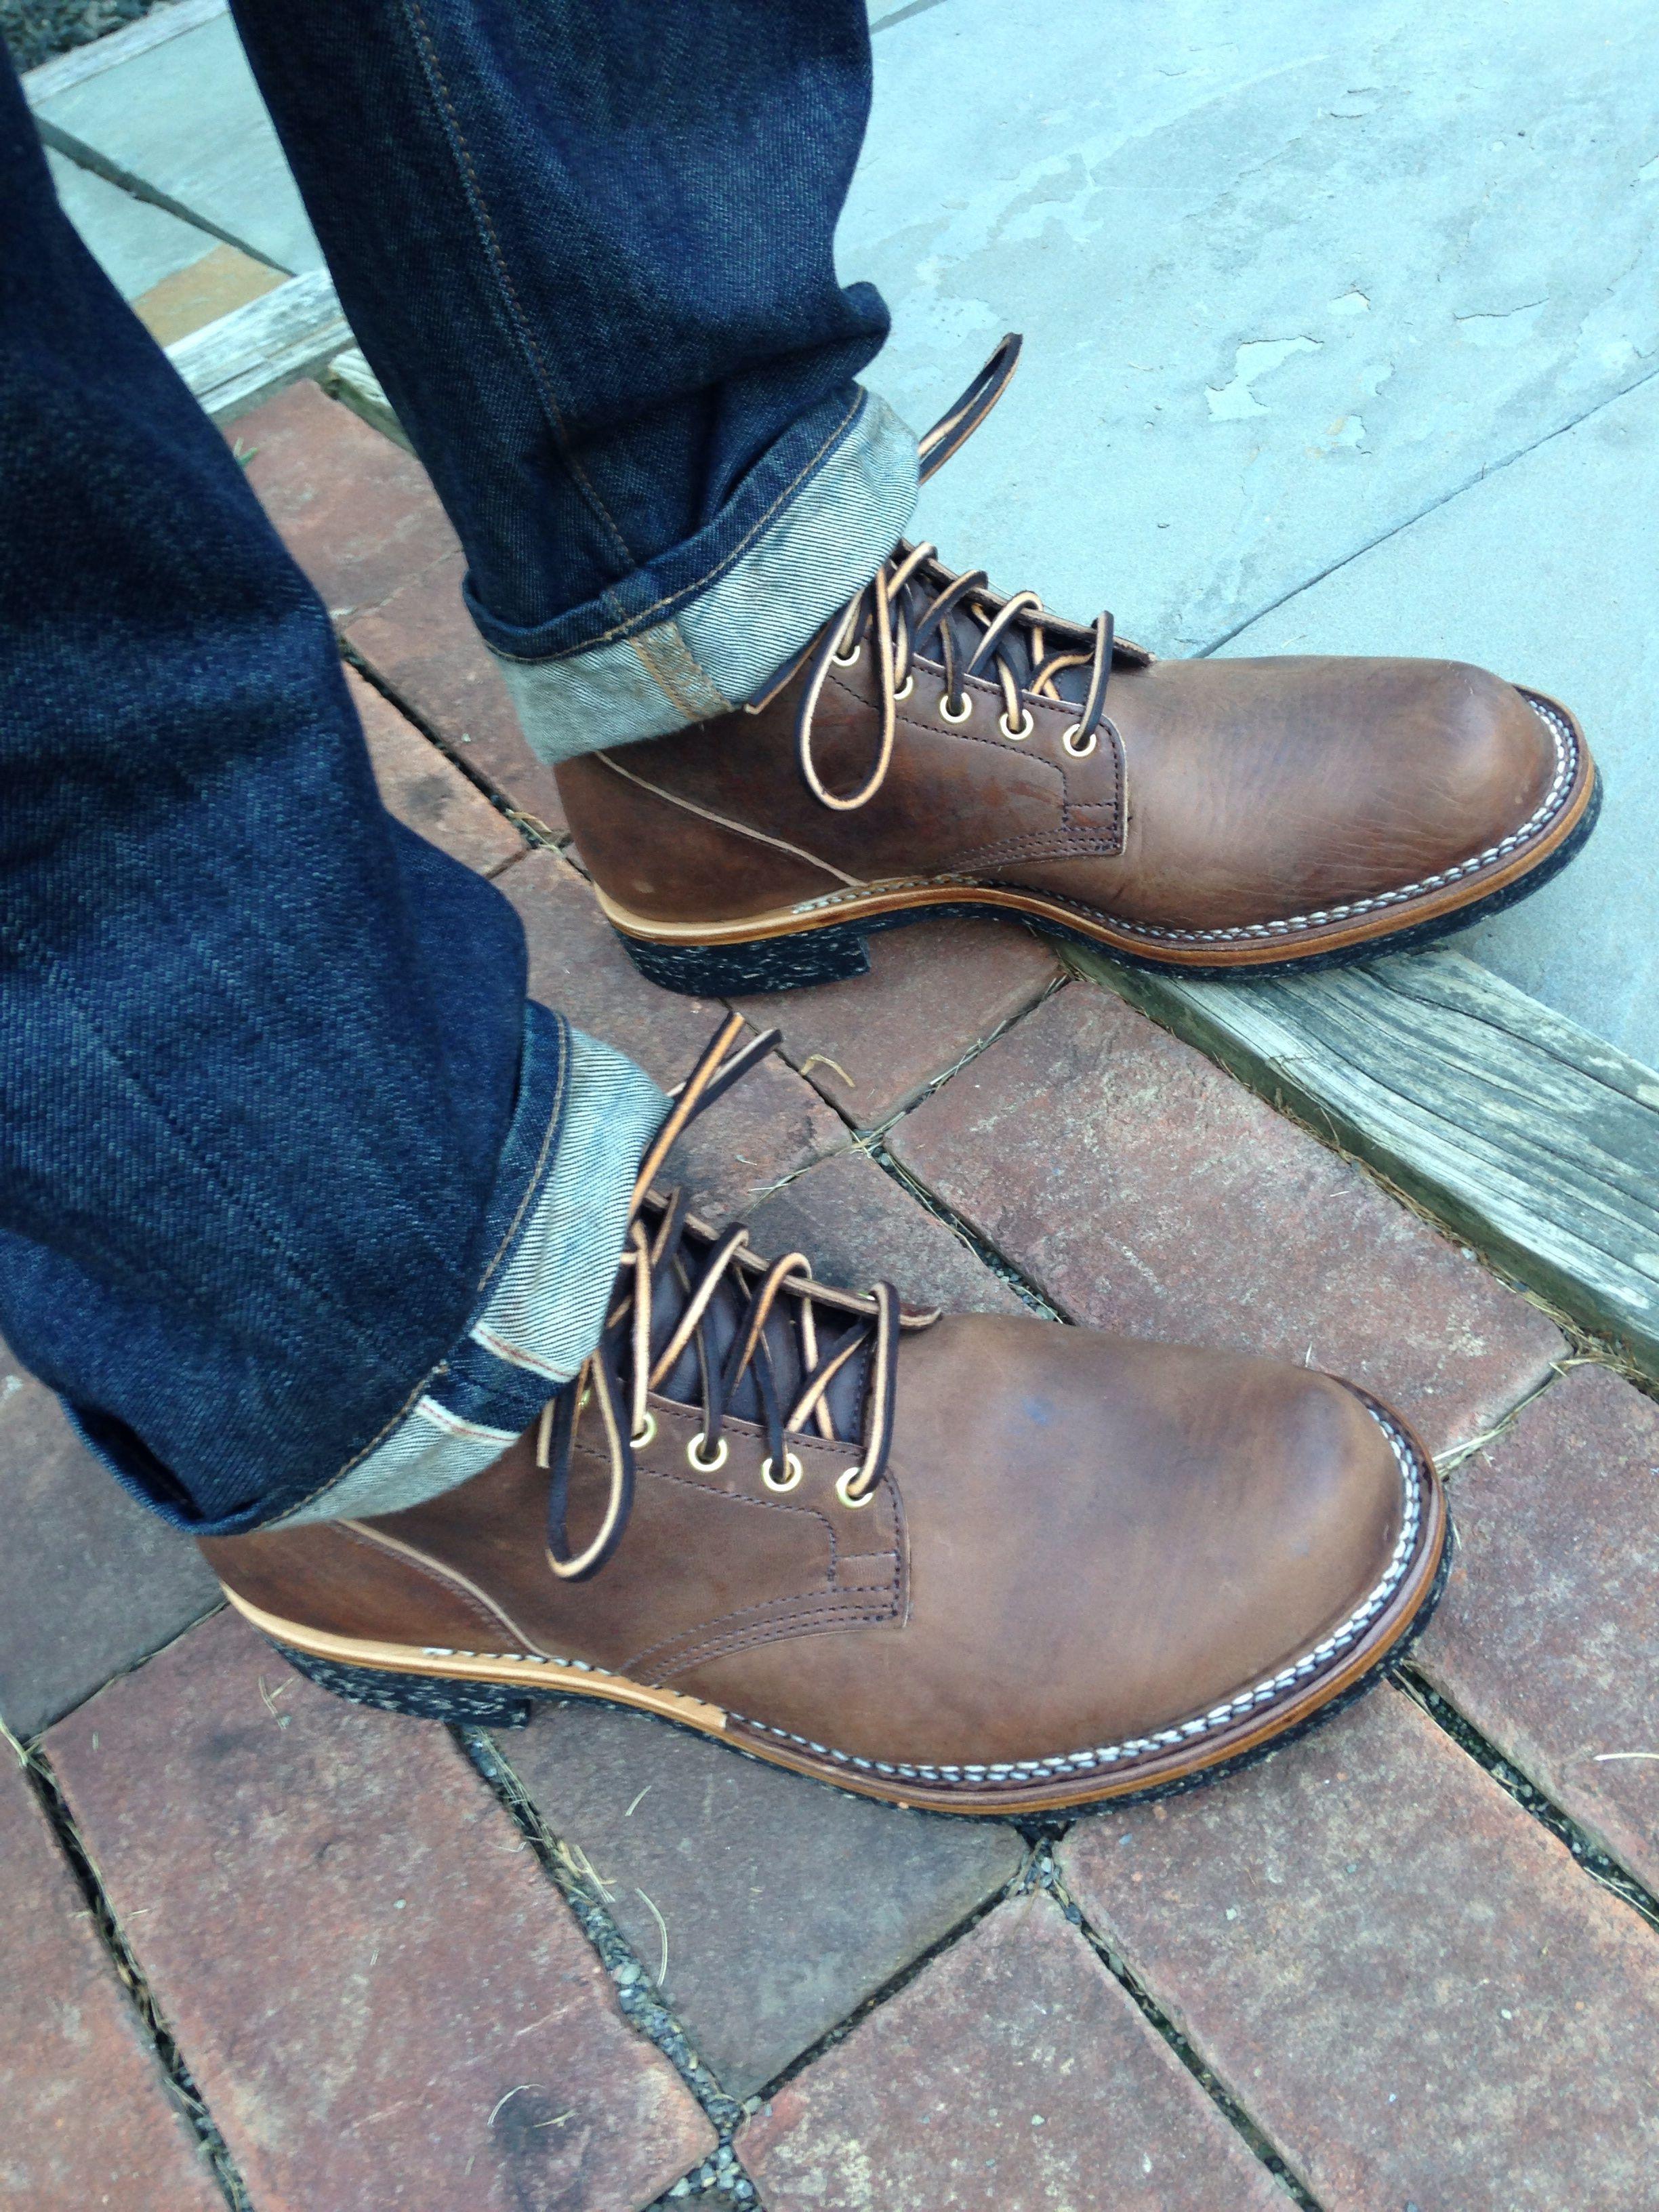 FENWAY's photos in Viberg Boots